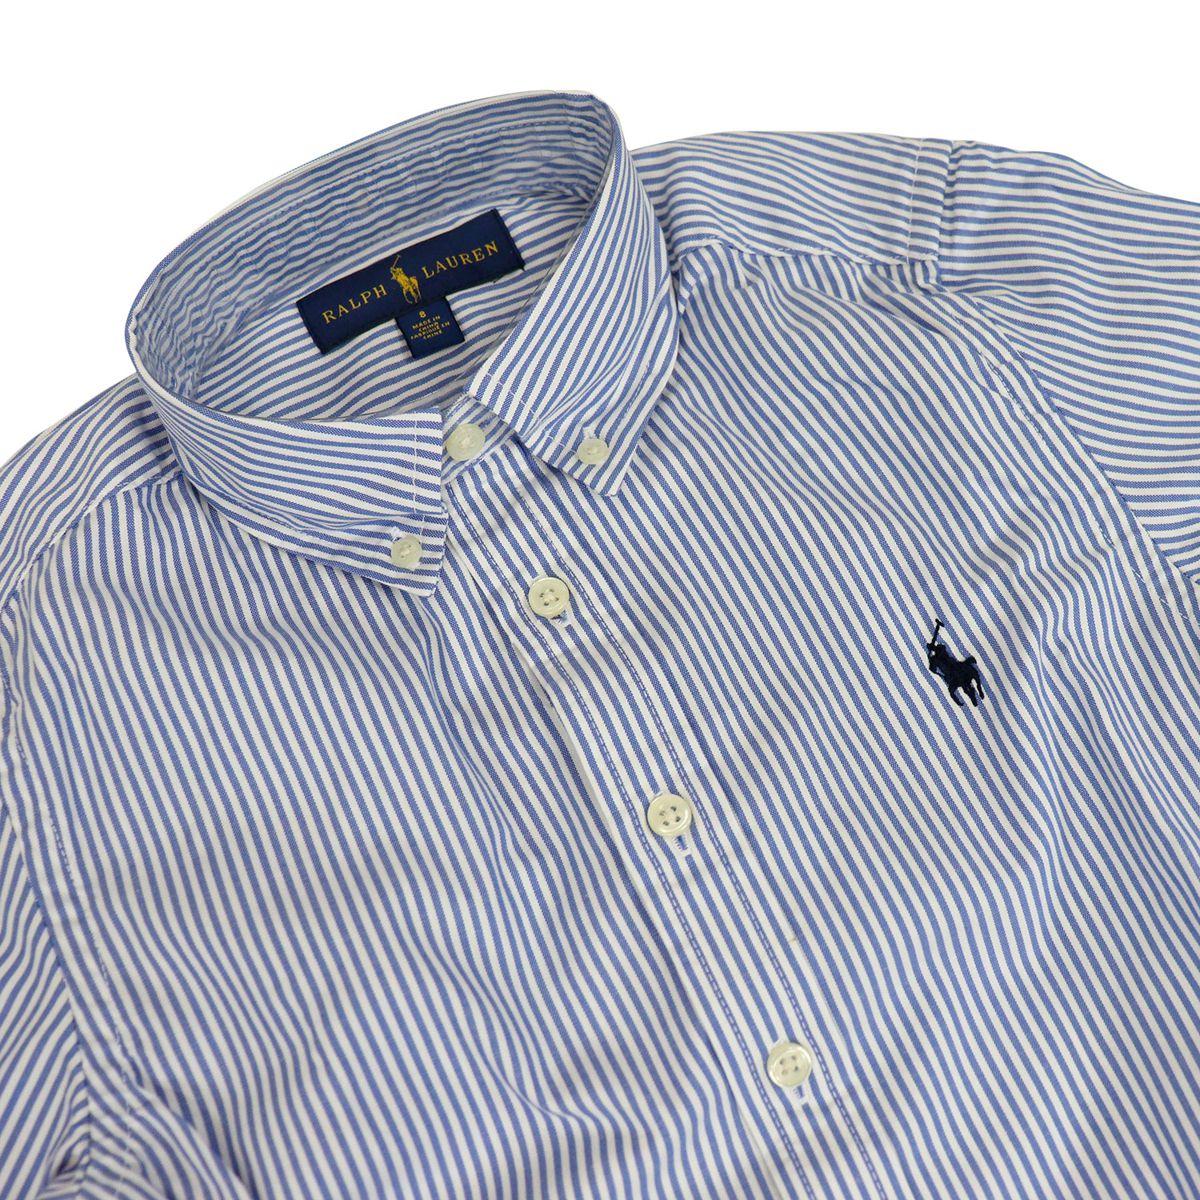 Cotton button-down shirt White / blue lines Polo Ralph Lauren